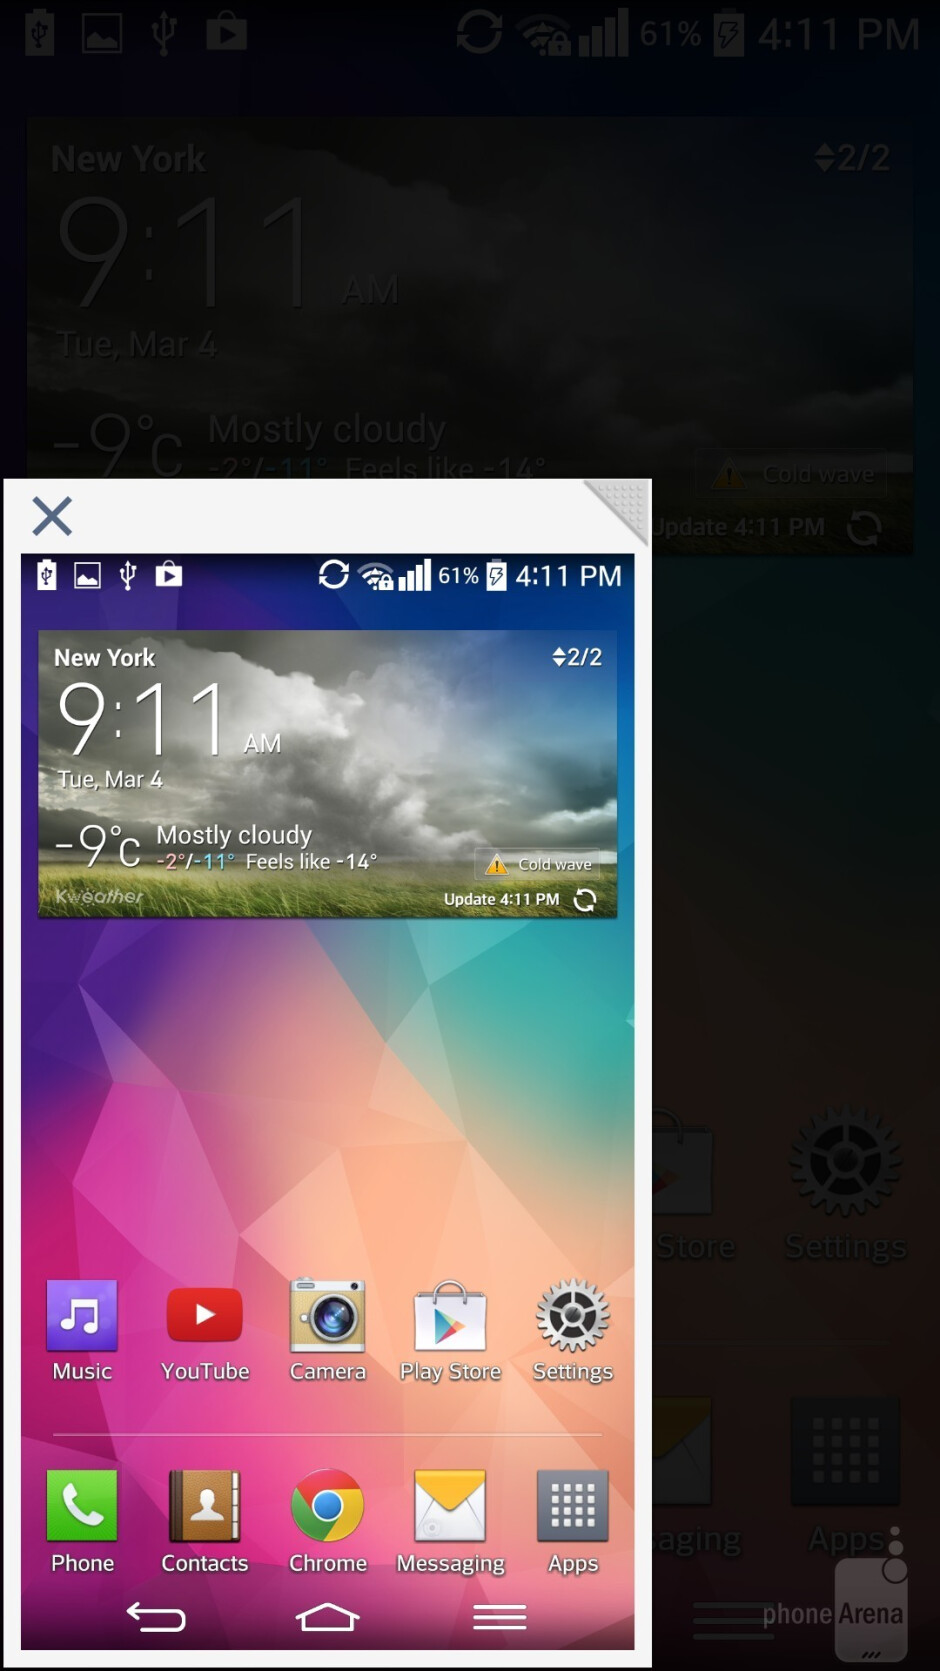 Whose one-handed mode do you like best (Apple, Samsung, LG)?